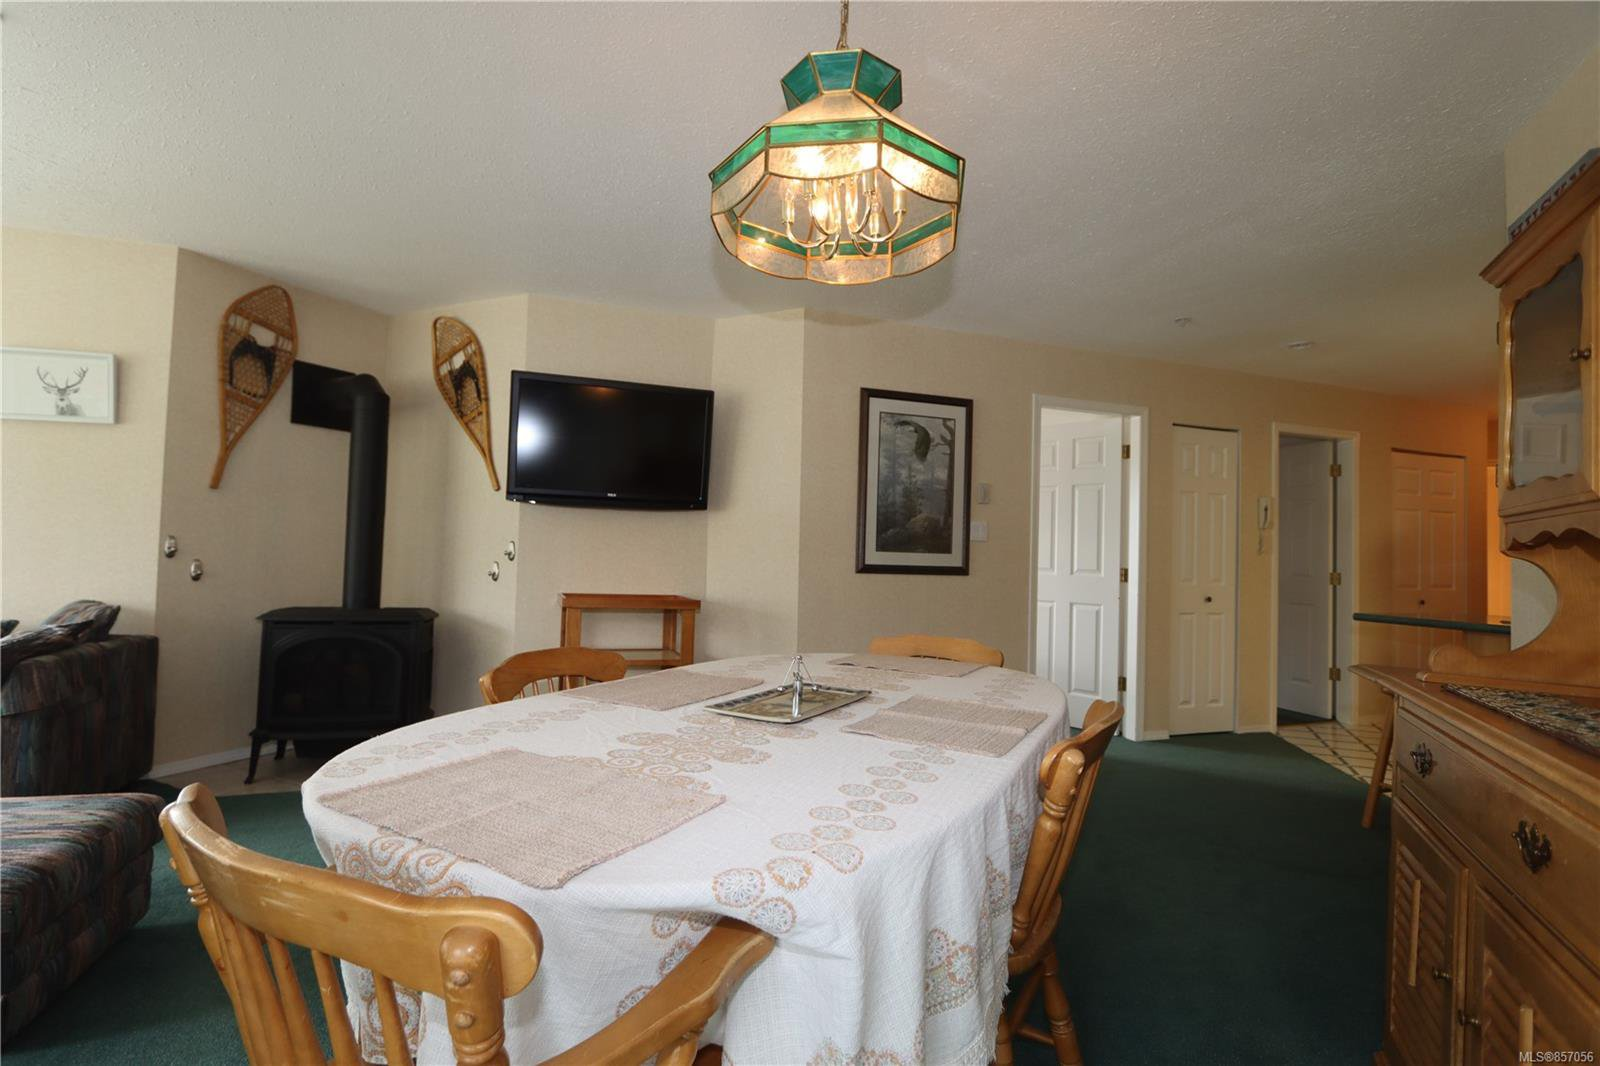 Photo 9: Photos: 118 1320 Henry Rd in : CV Mt Washington Condo for sale (Comox Valley)  : MLS®# 857056